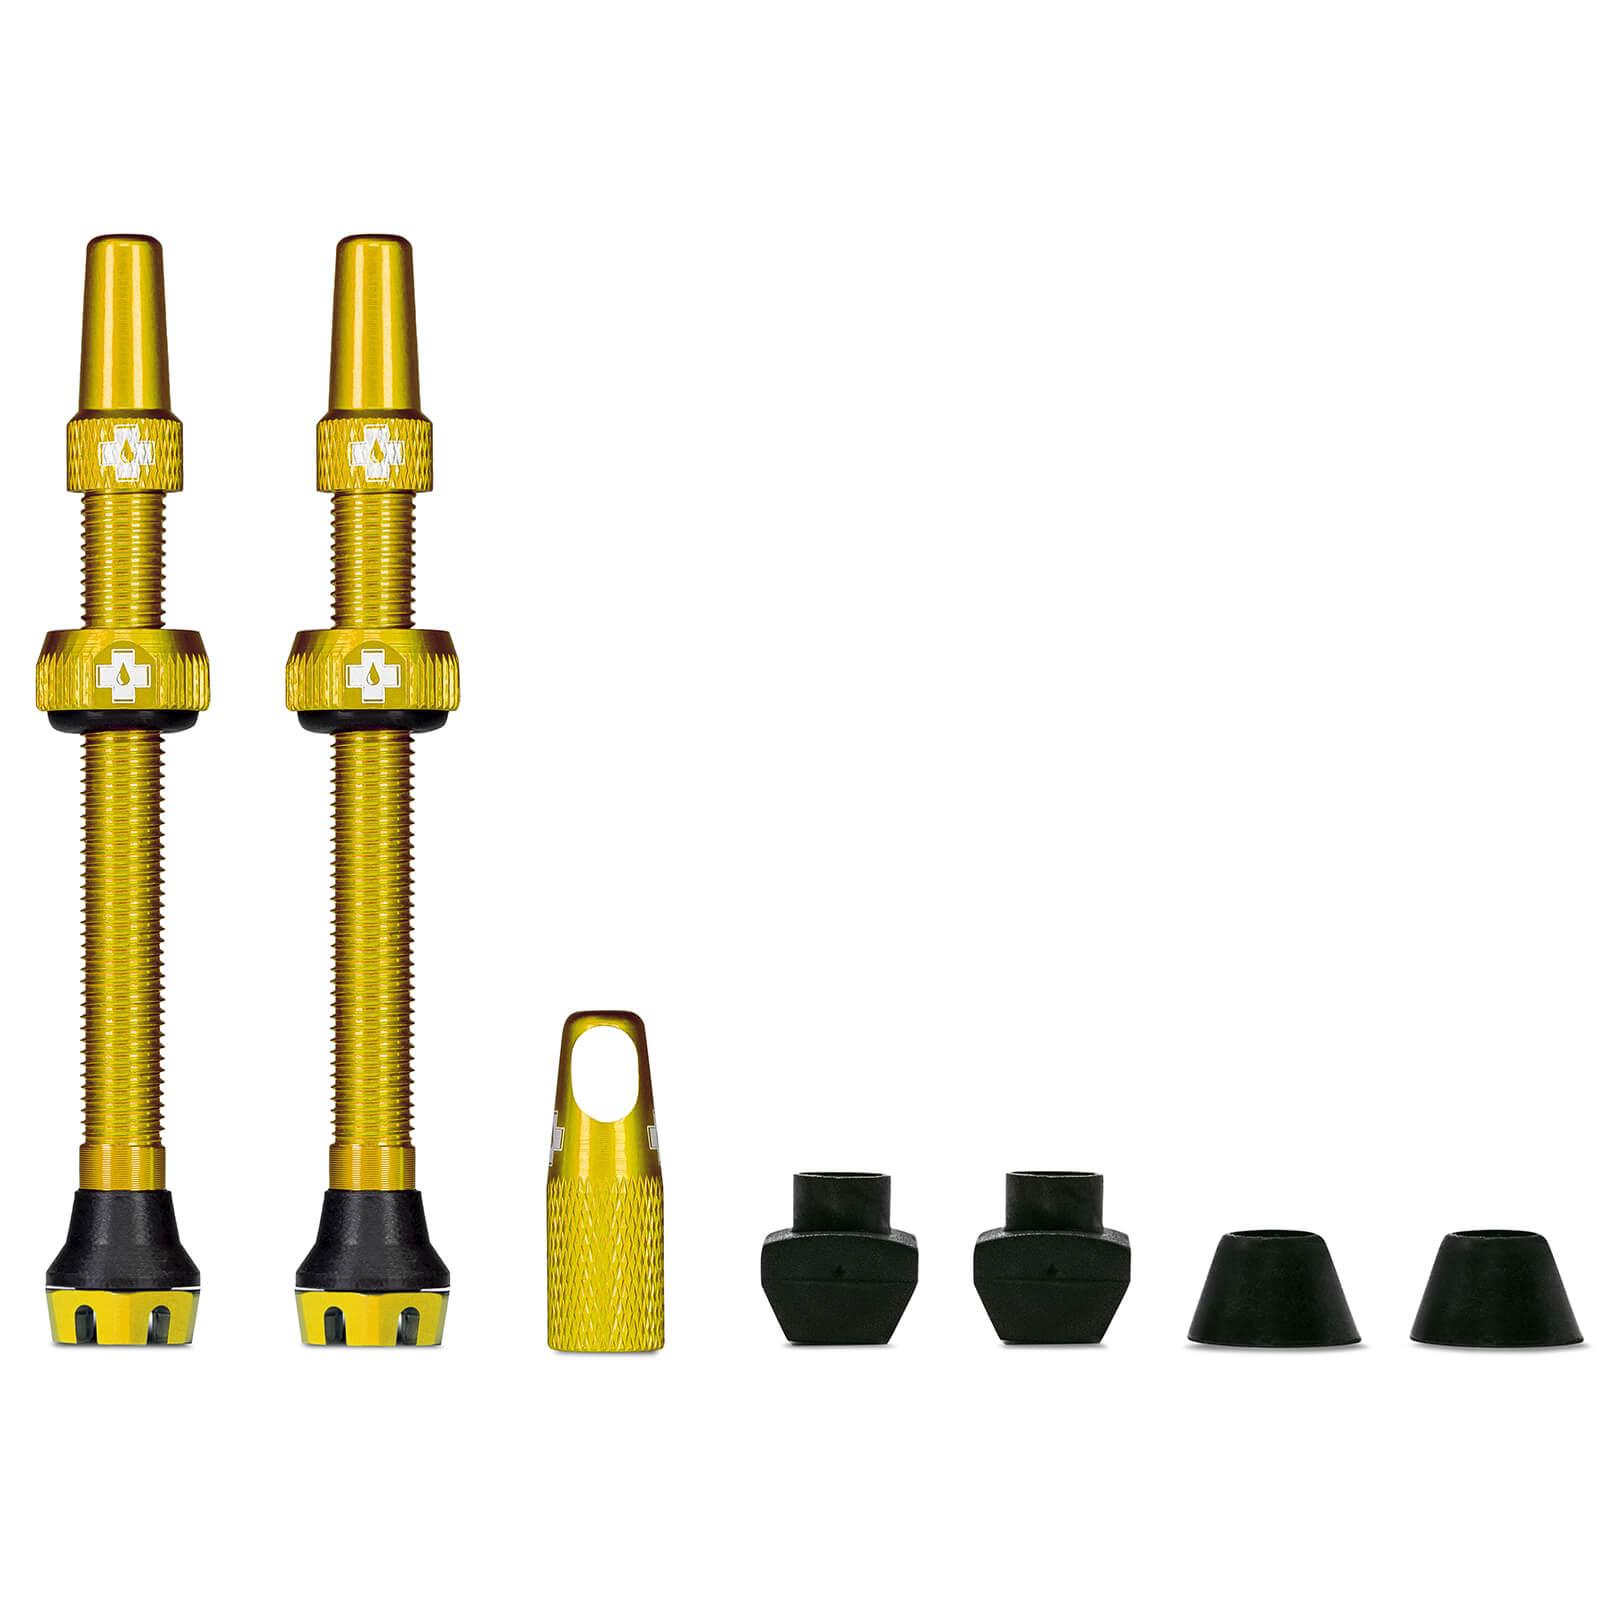 Pro Griffon Carbon Rail Saddle - 152mm - Anatomic Fit